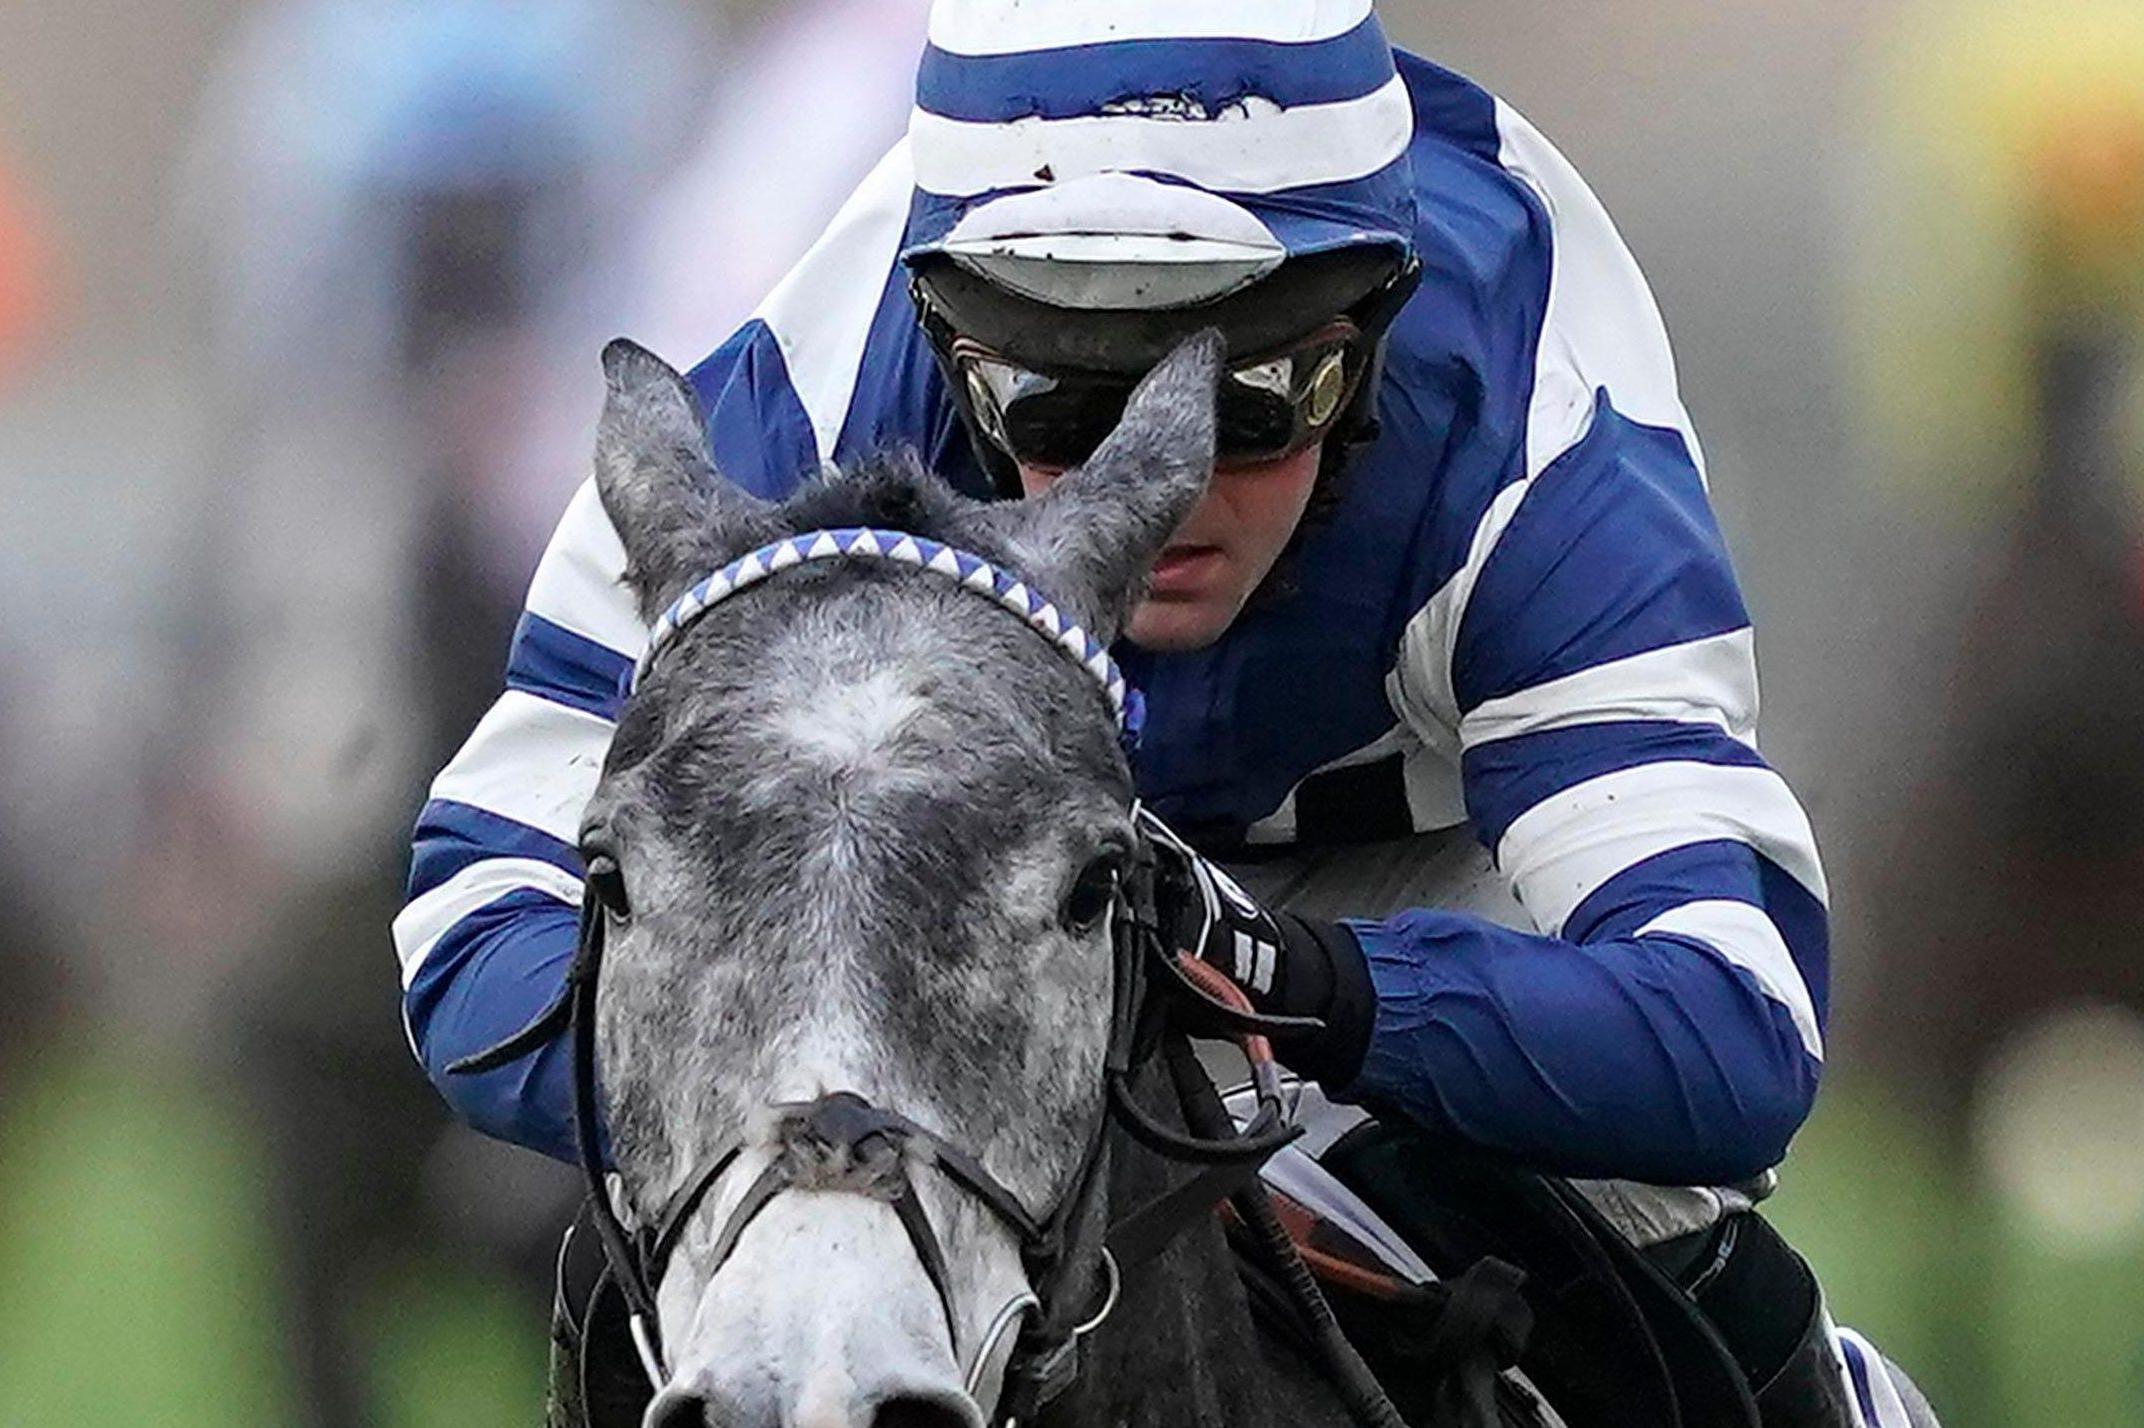 Equine Flu: Equine Flu Outbreak Results In ALL UK Horse Race Meetings